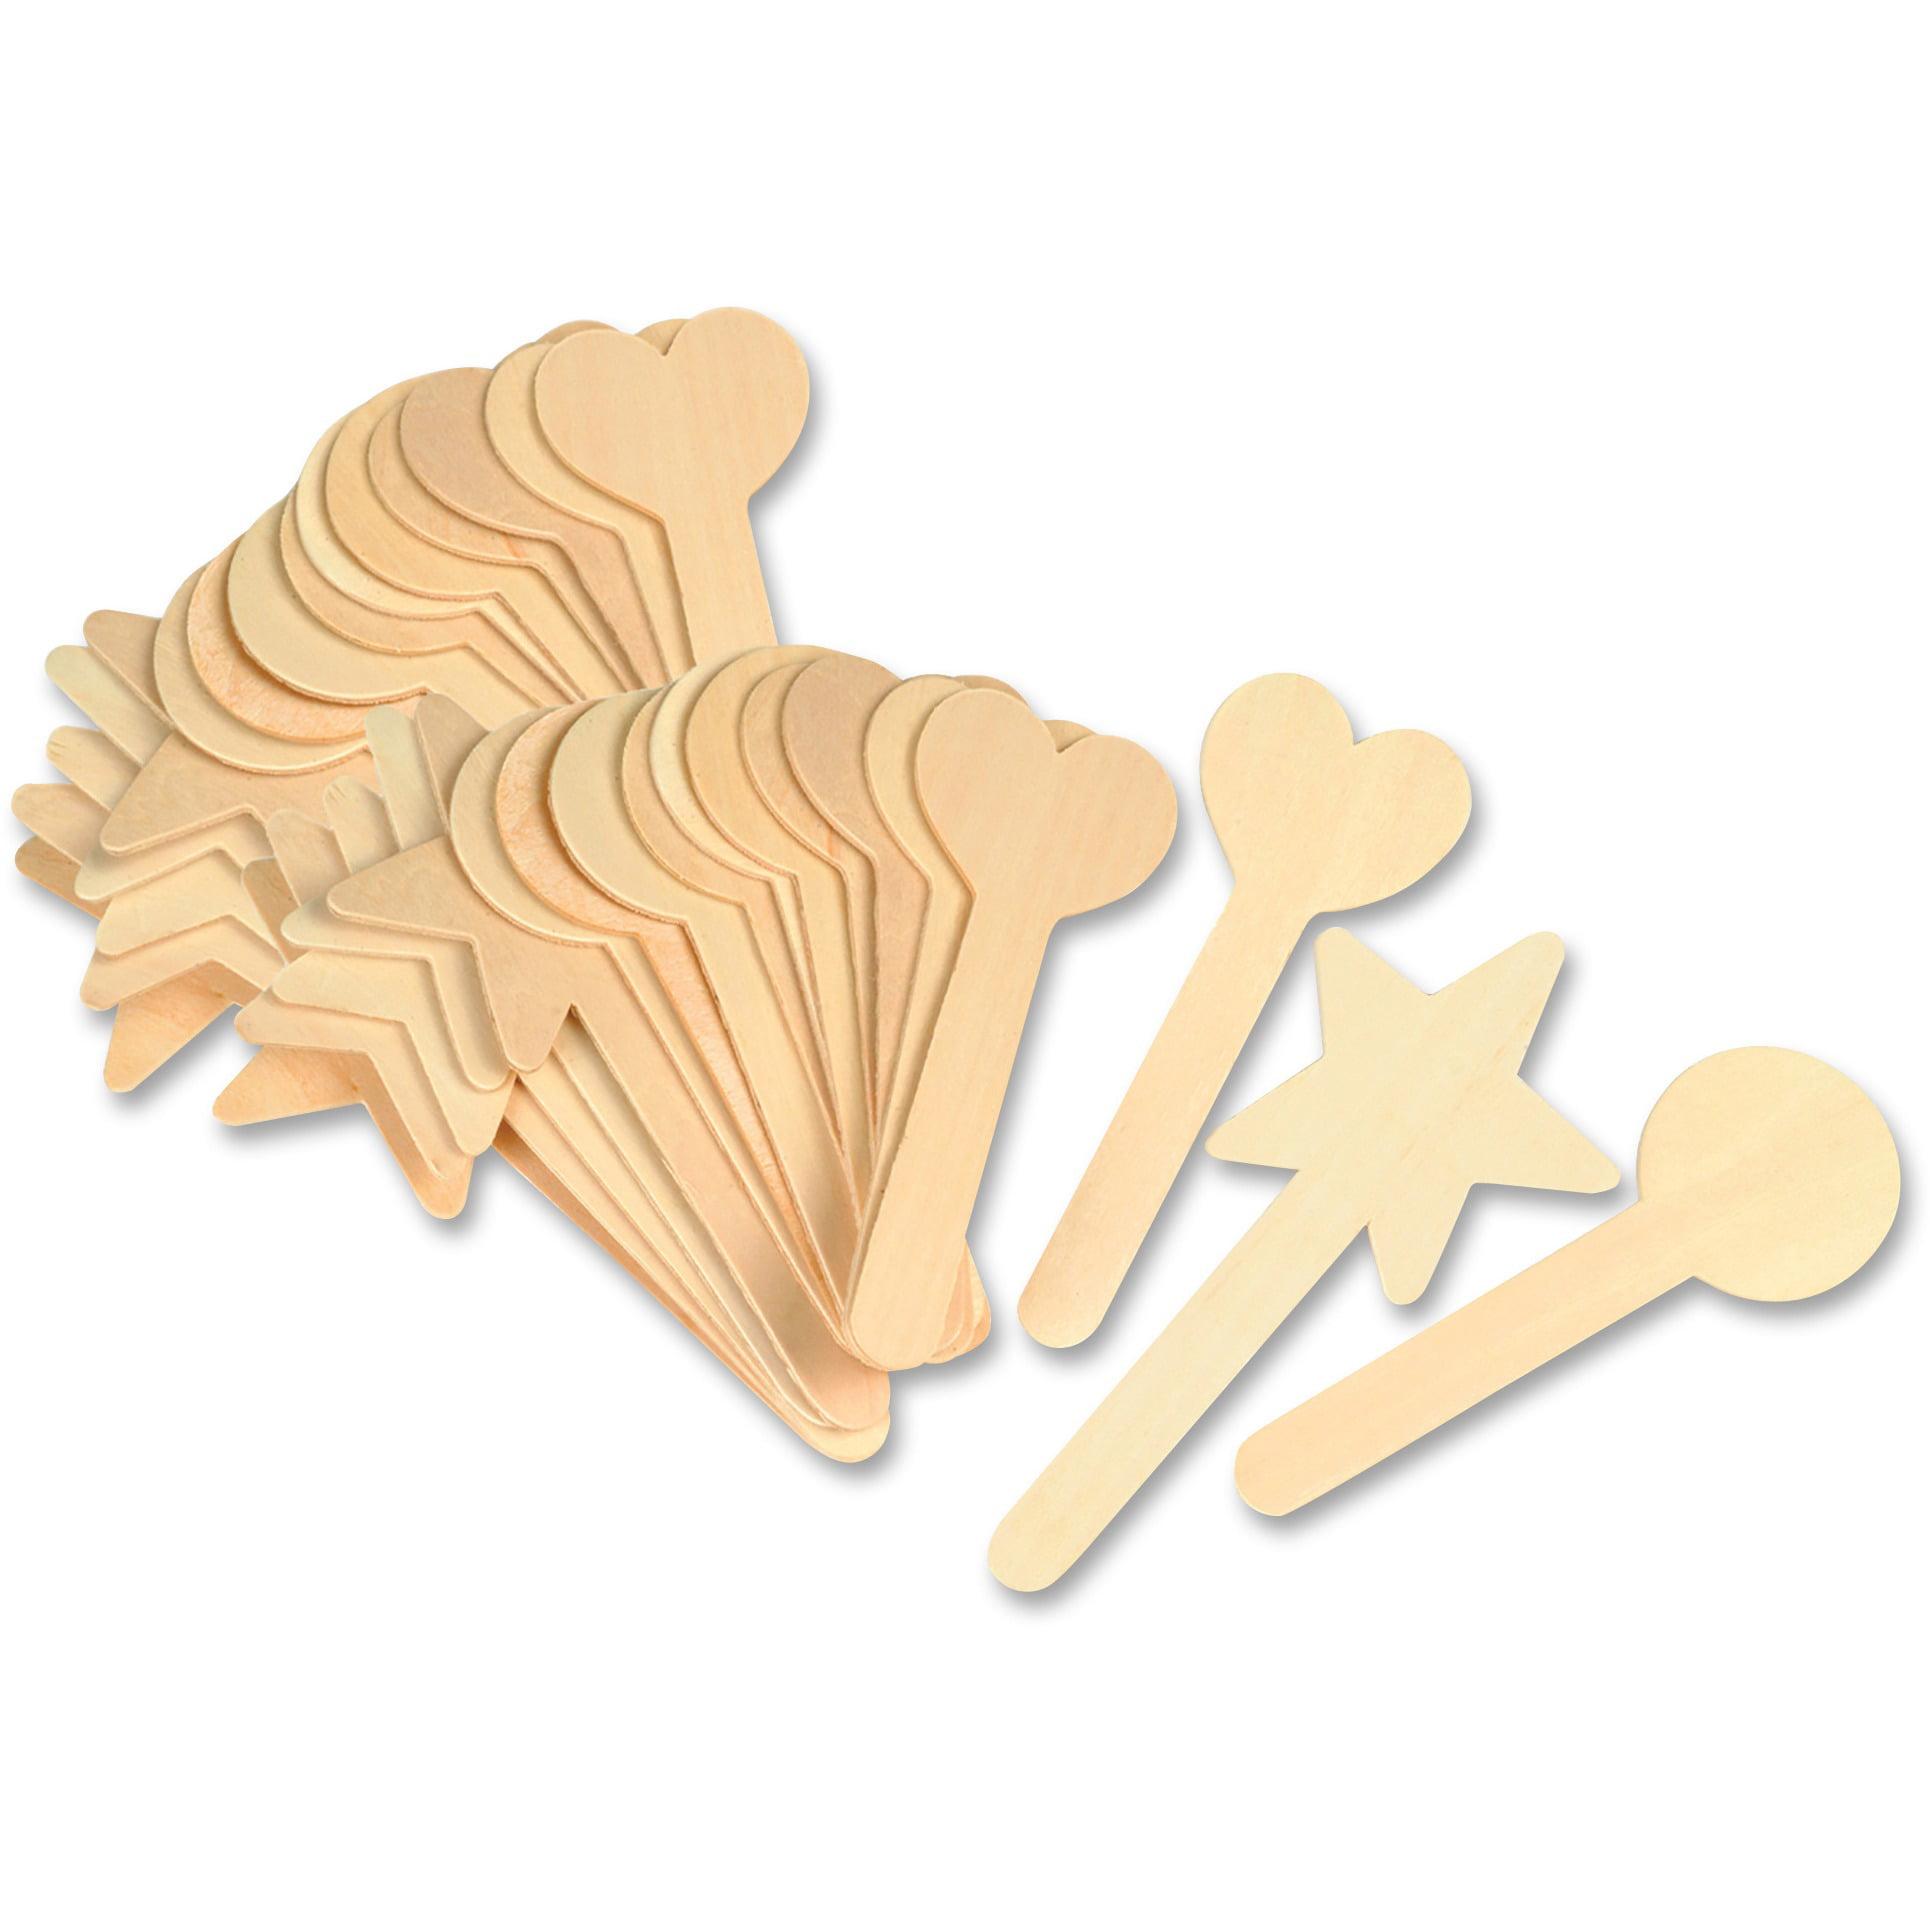 Creativity Street, CKC362902, Geometric Shapes Wood Craft Sticks, 36 / Pack, Natural